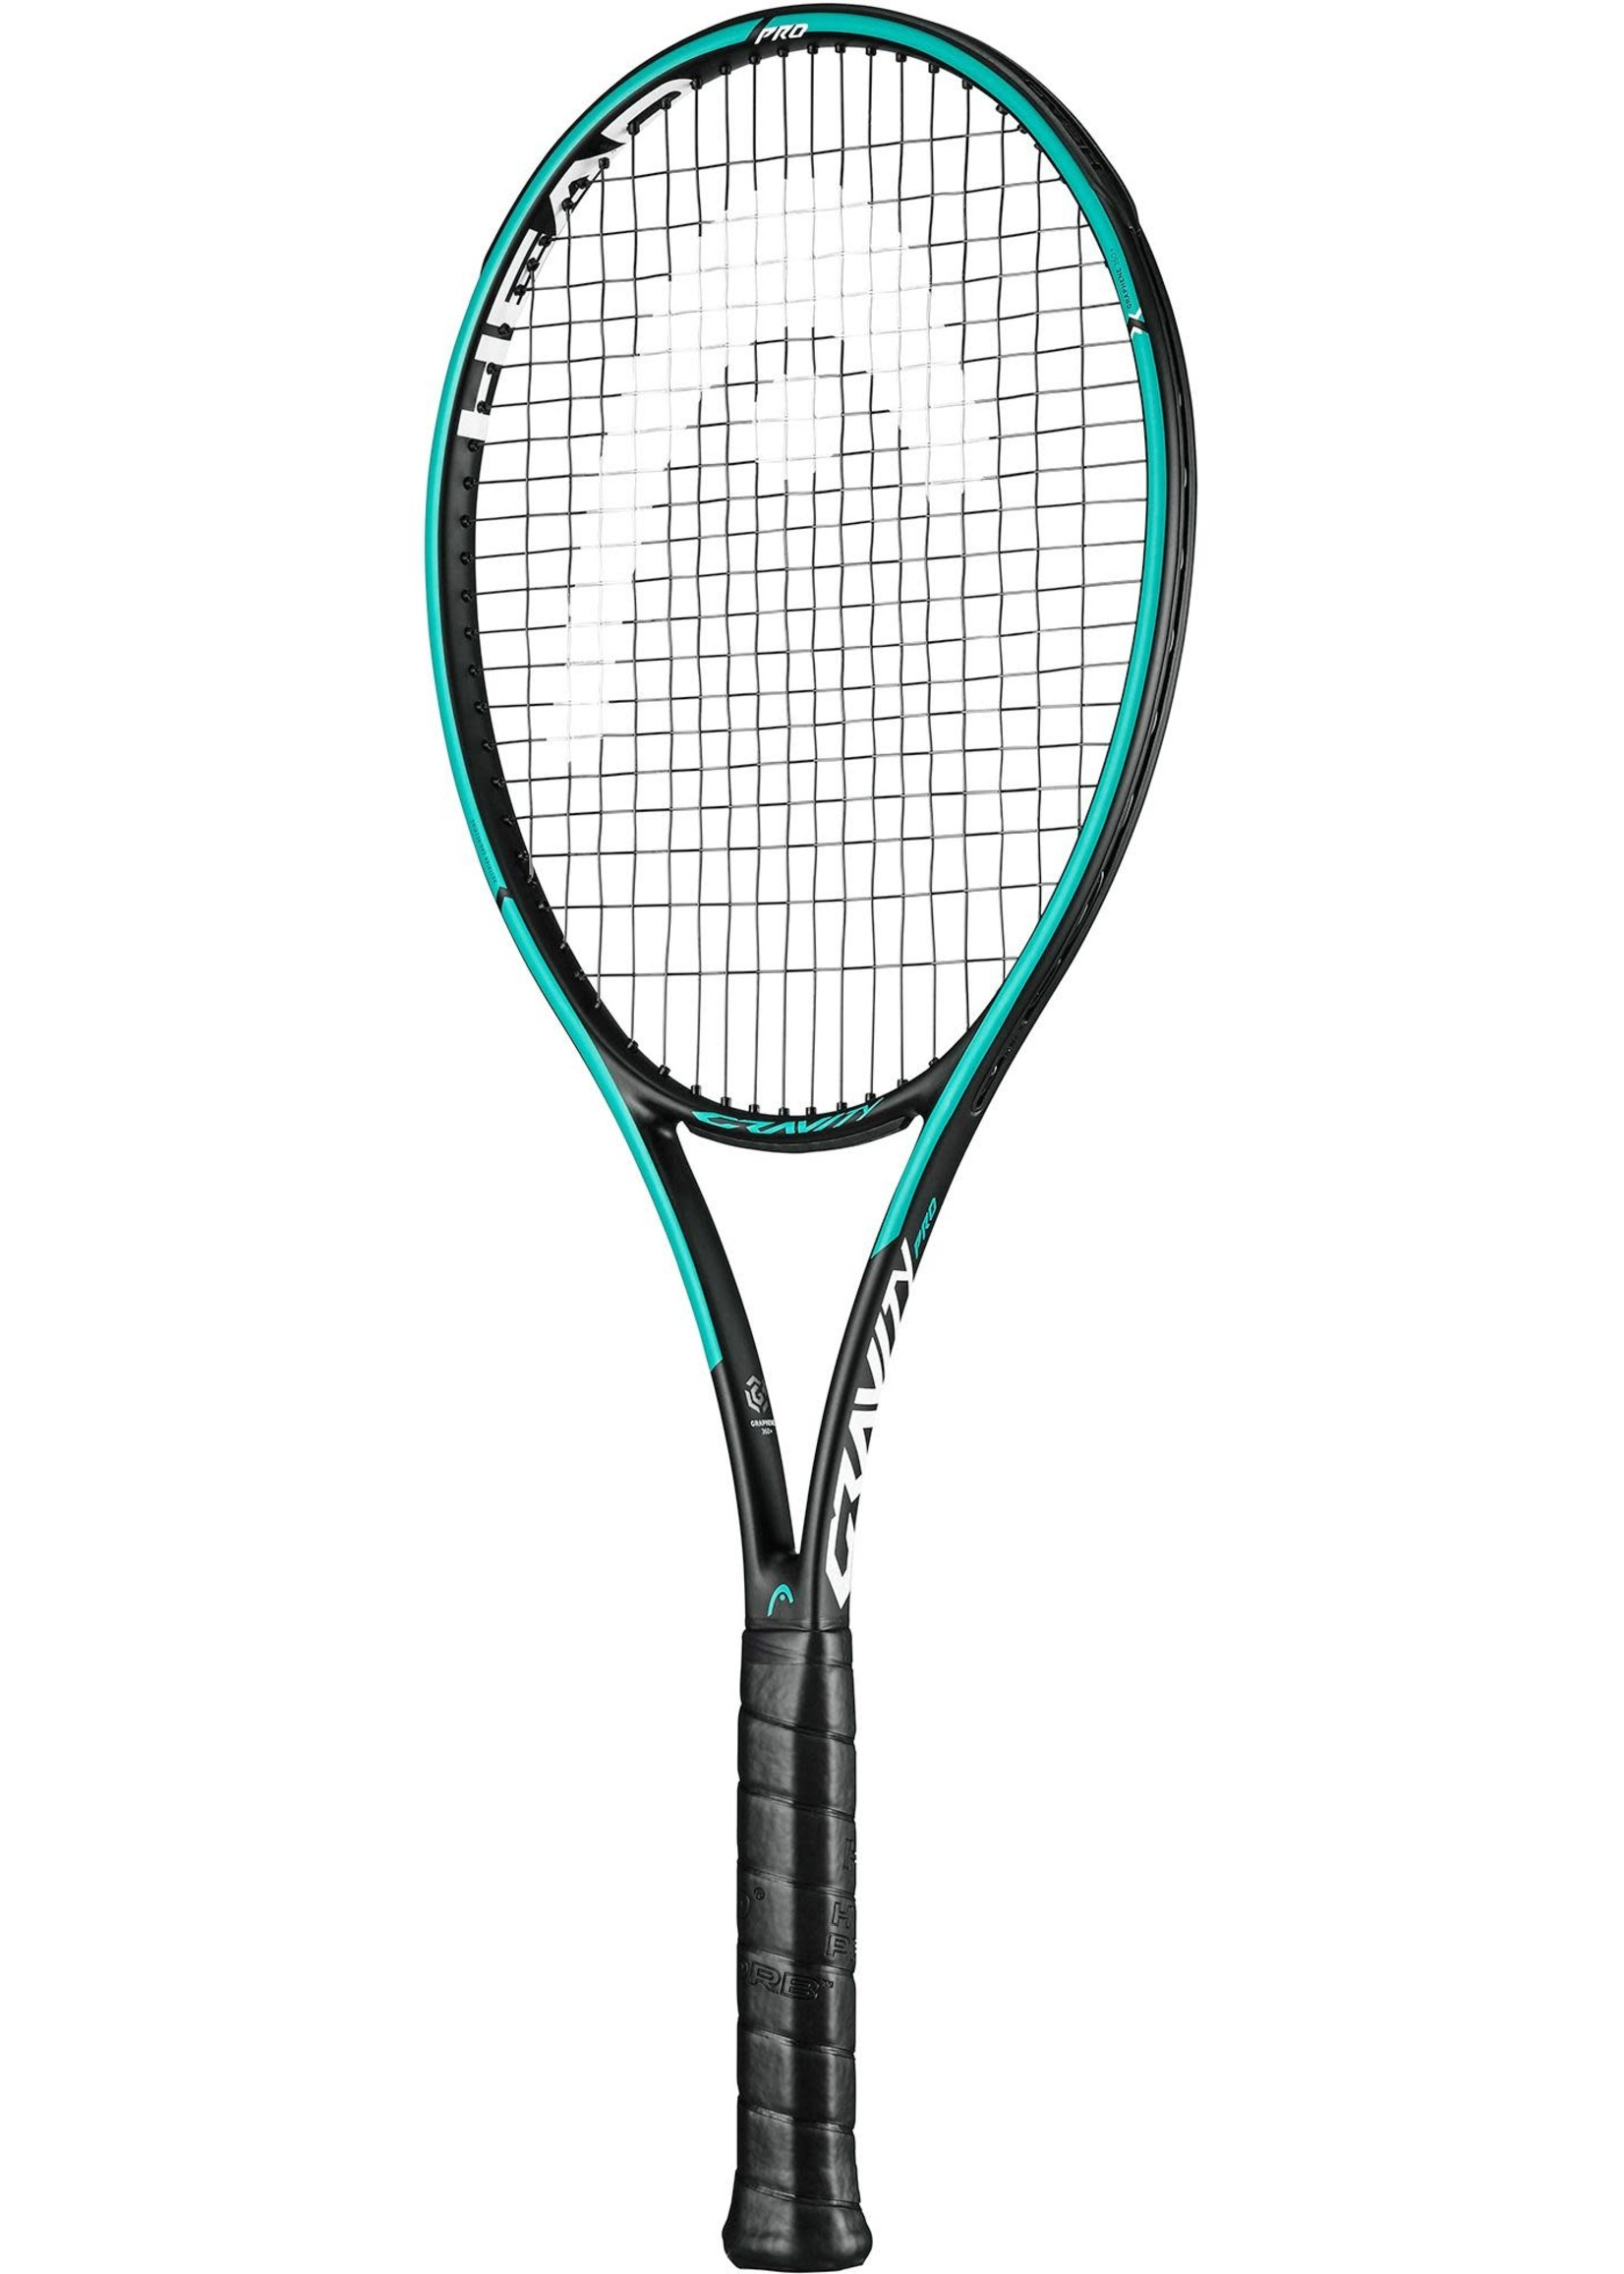 Head Head Graphene 360+ Gravity Pro Tennis Racket (2019)